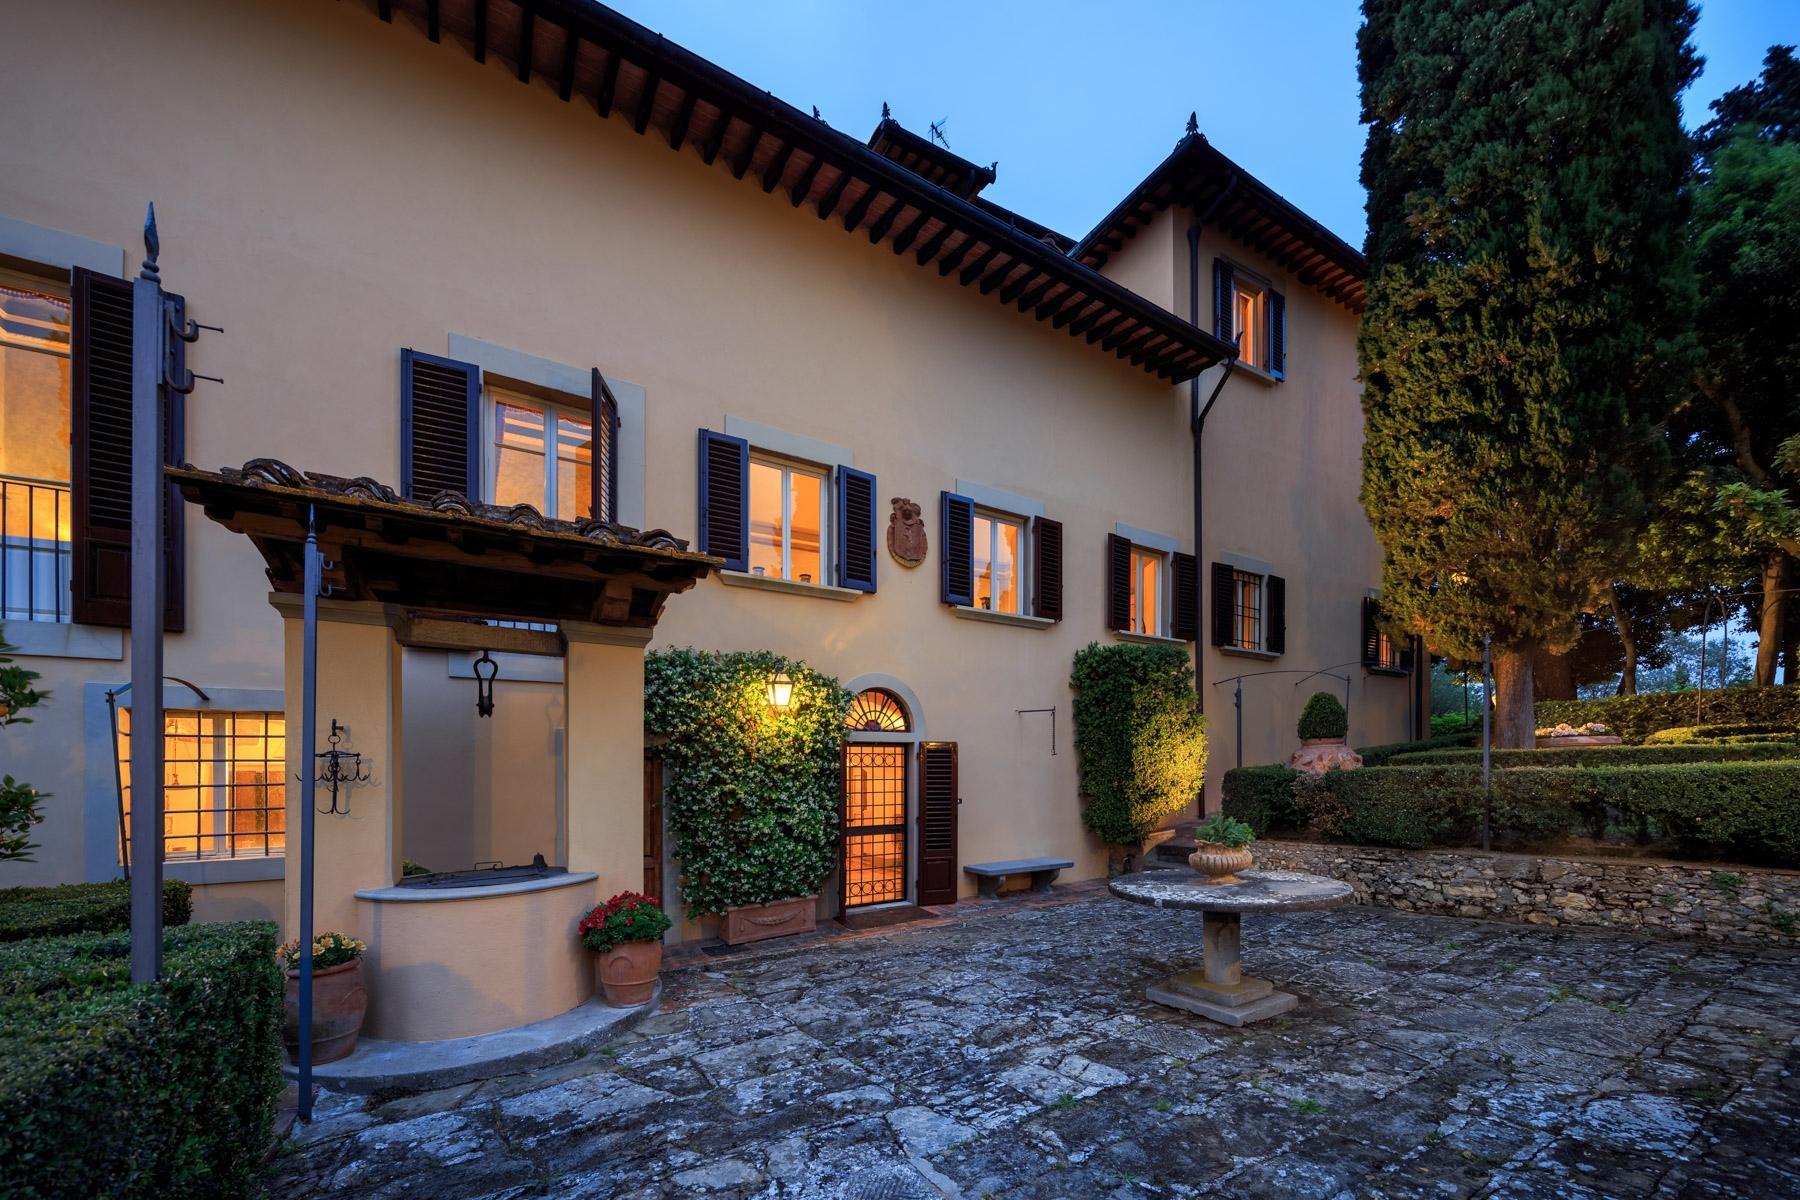 Pregevole villa Cinquecentesca - 3